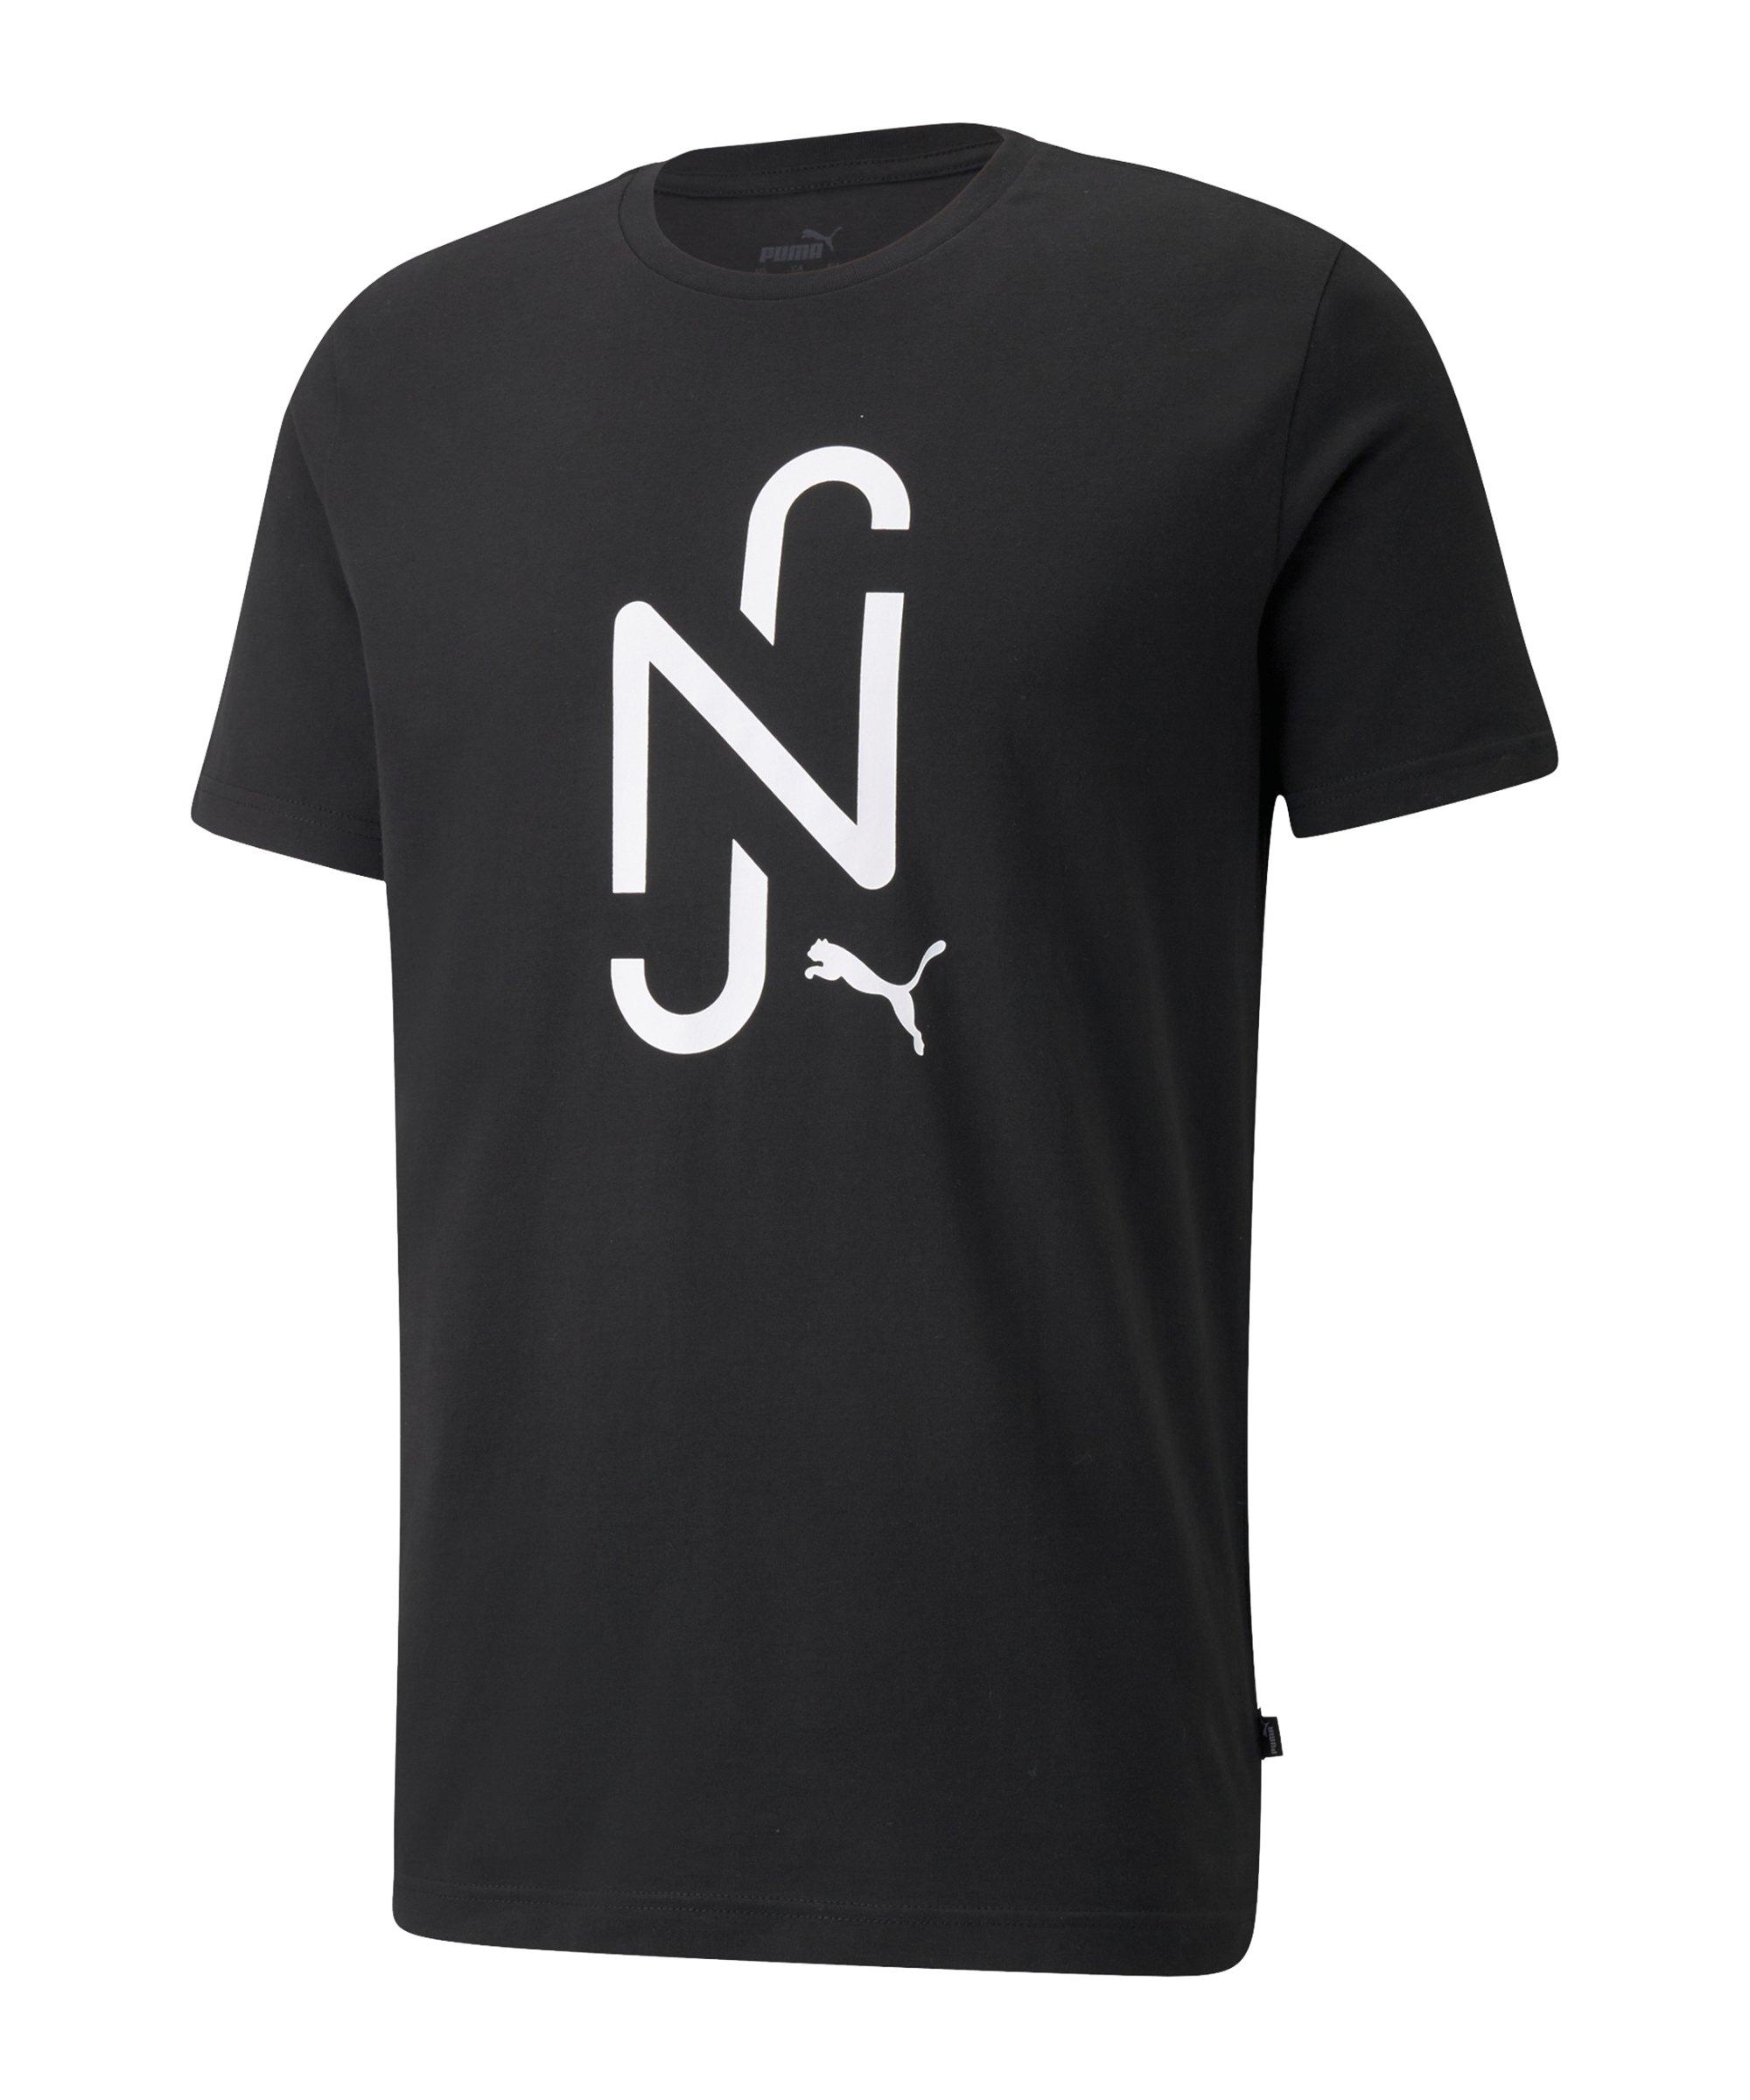 PUMA NJR 2.0 Logo T-Shirt Schwarz F01 - schwarz